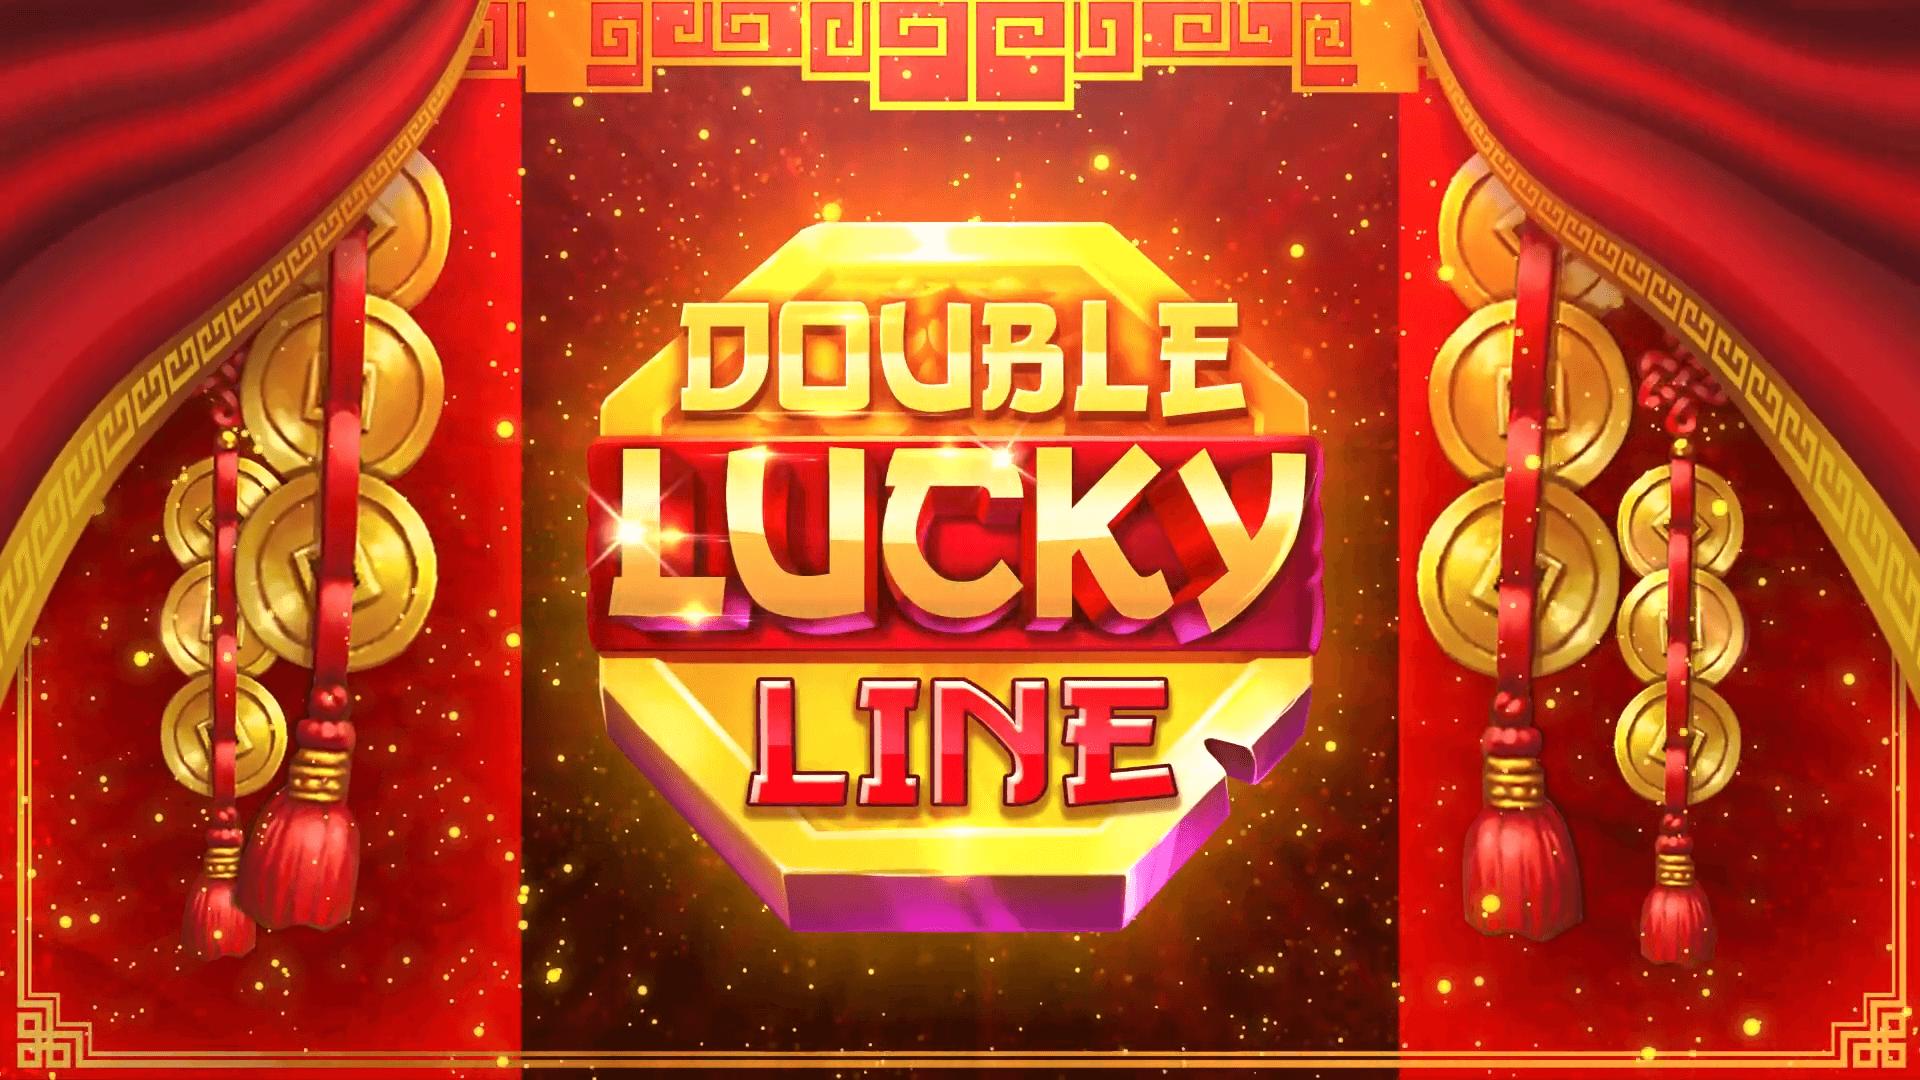 Double Lucky Line CS